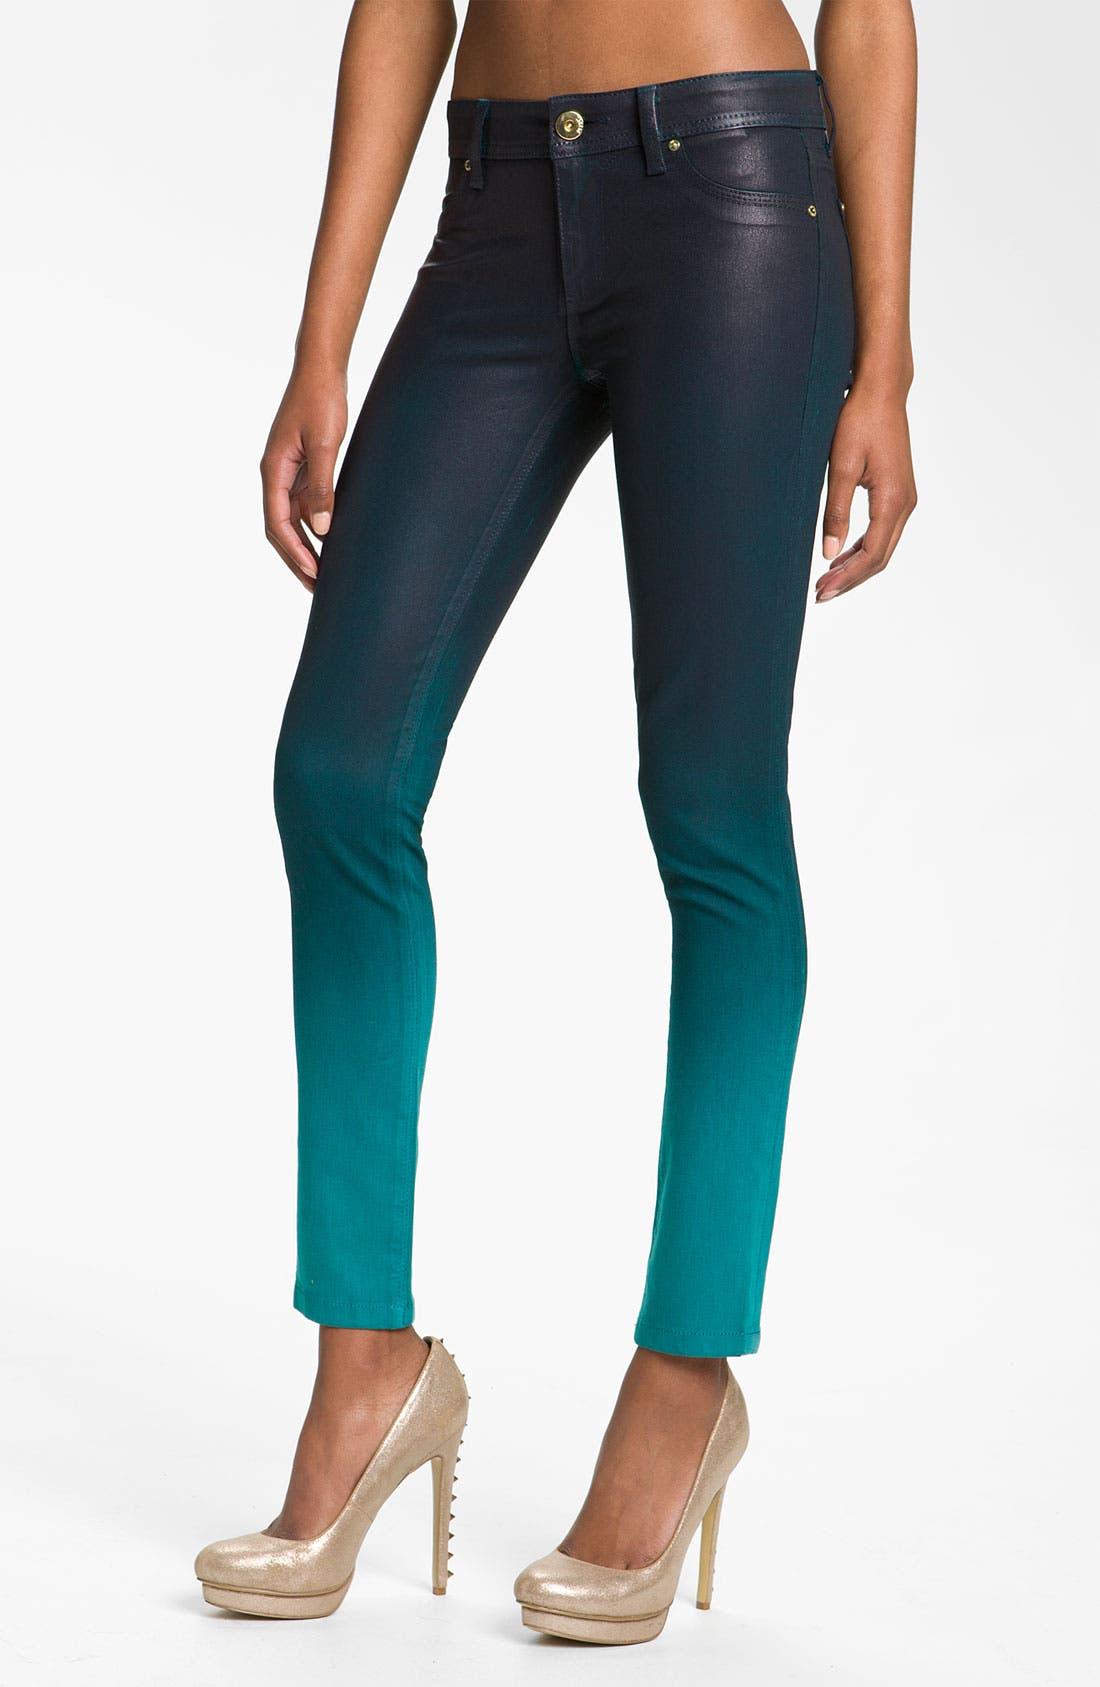 Main Image - DL1961 'Emma' Waxed Skinny Jeans (Bali)